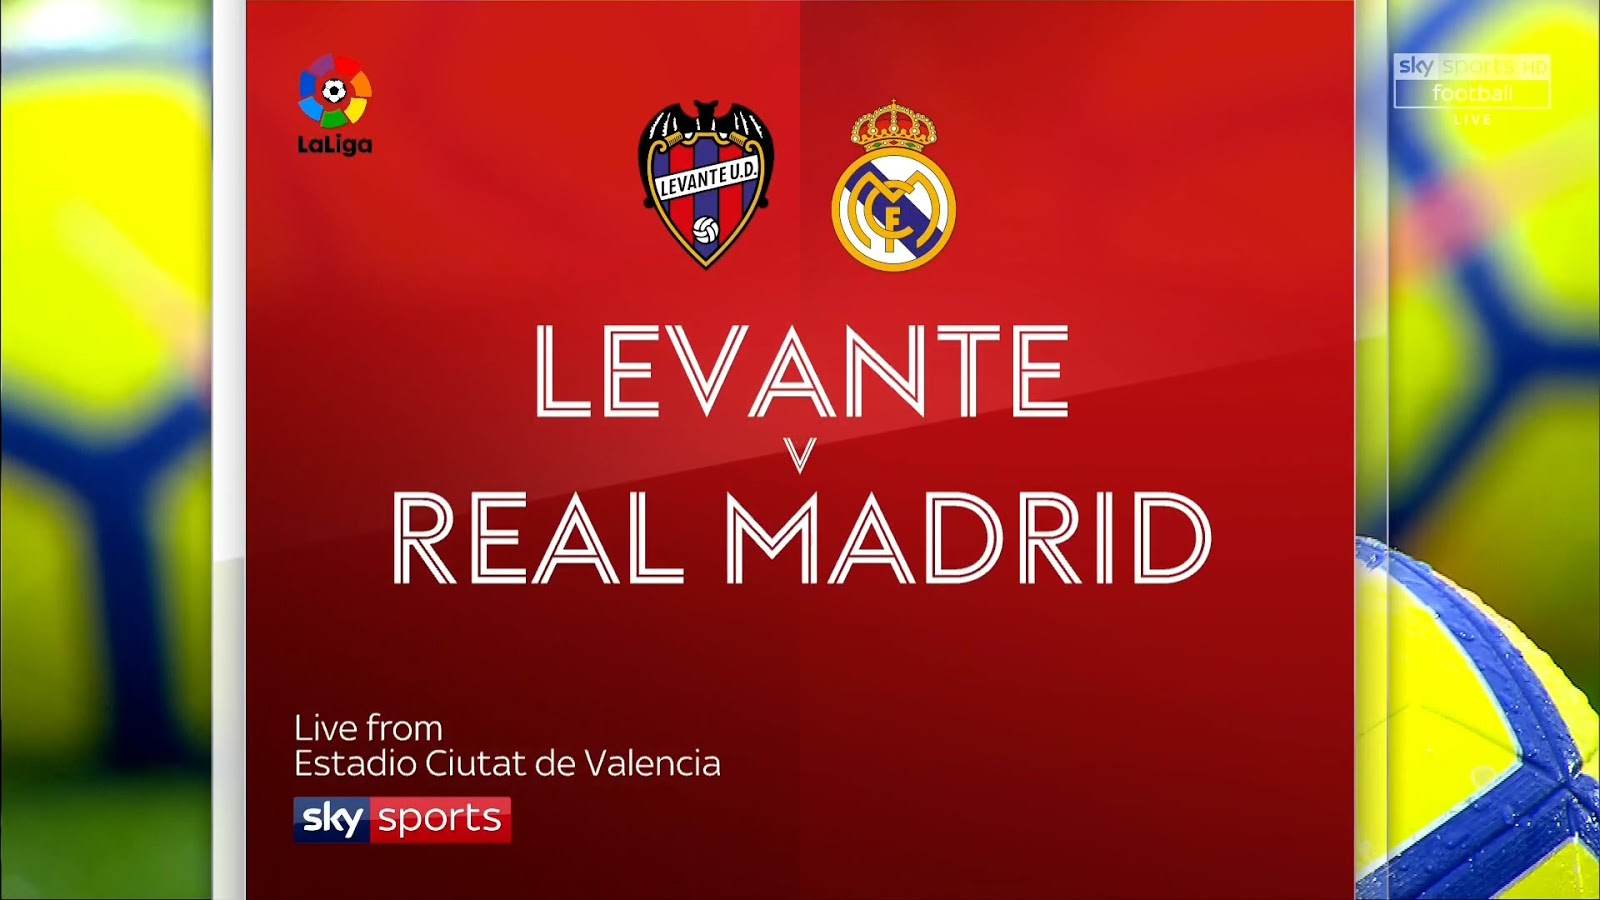 Levante vs. Real Madrid